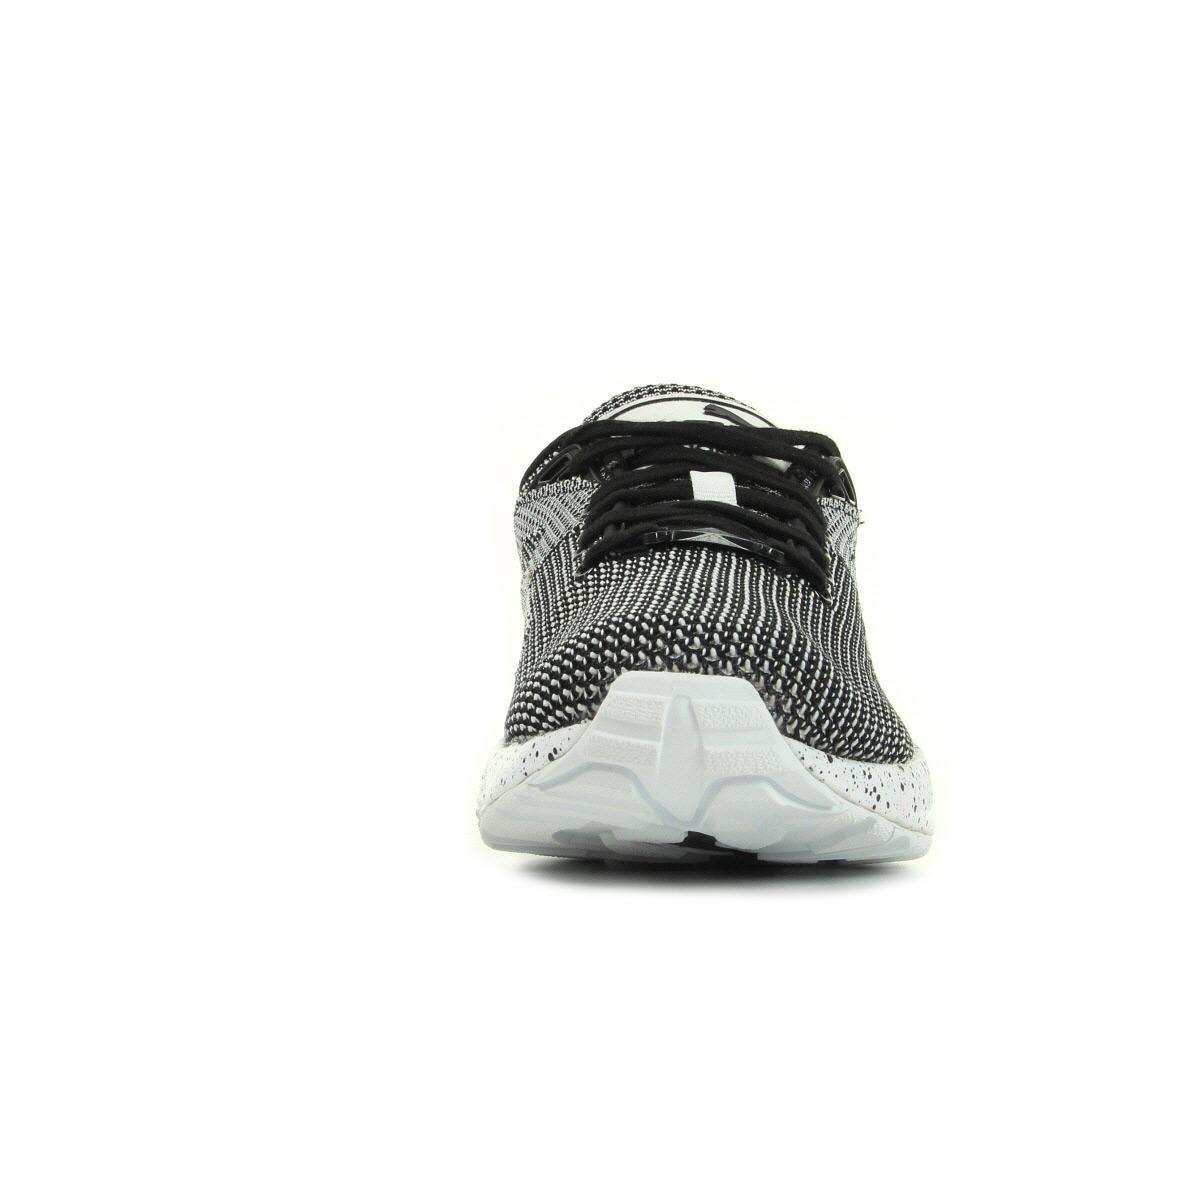 Puma R698 Knit Speckle 36322401, Baskets mode